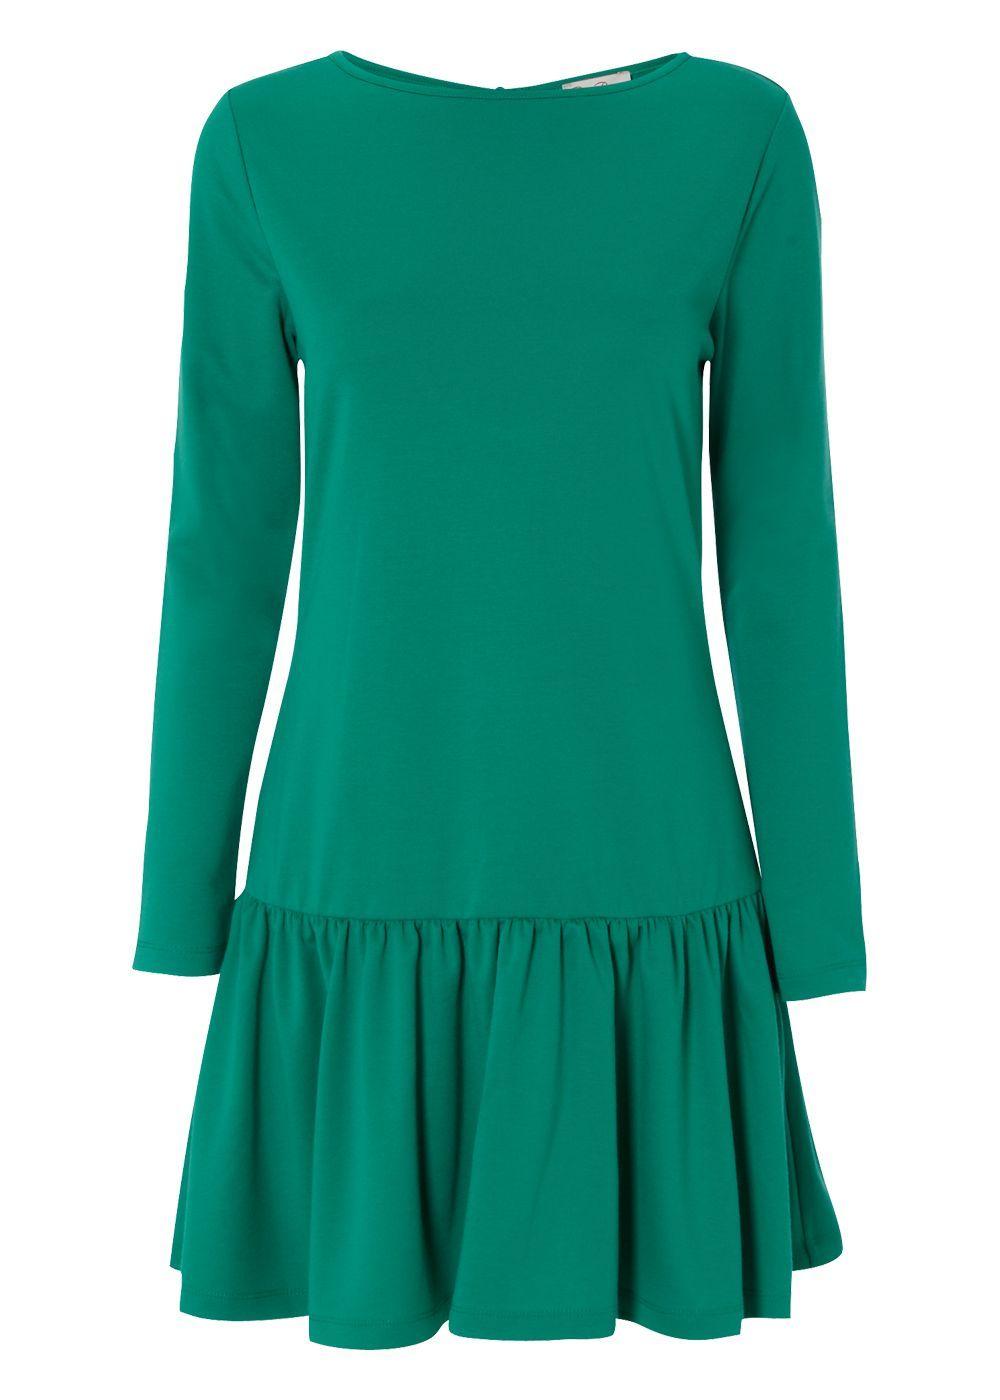 Matalan - Be Beau Ponte Drop Waist Dress In Green | My Style ...